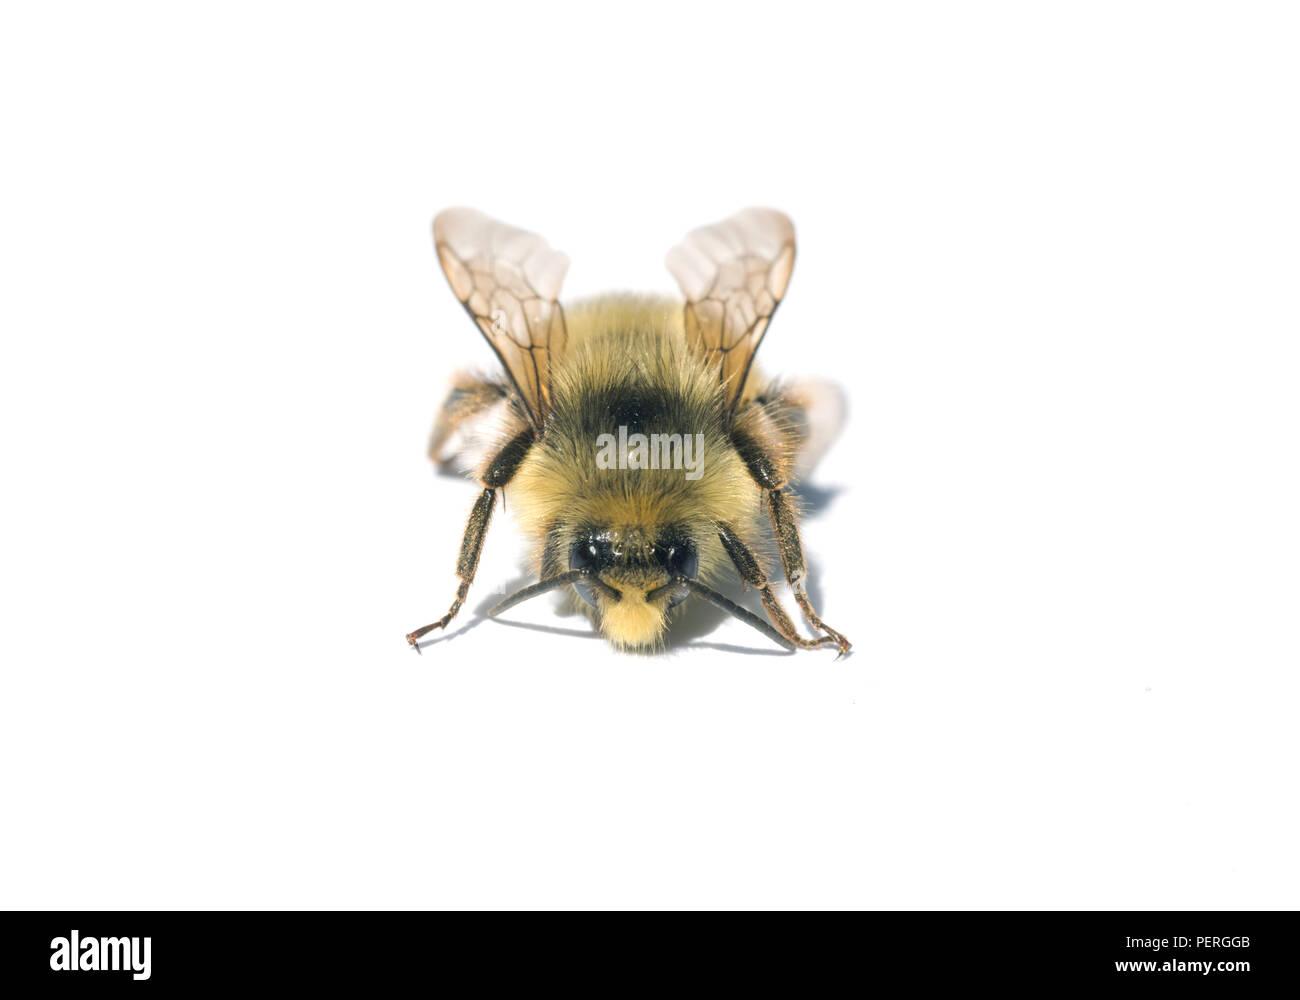 Con cuernos Fuzzy abejorro (Bombus mixtus), cerca de las Montañas Cascade, en Washington Imagen De Stock